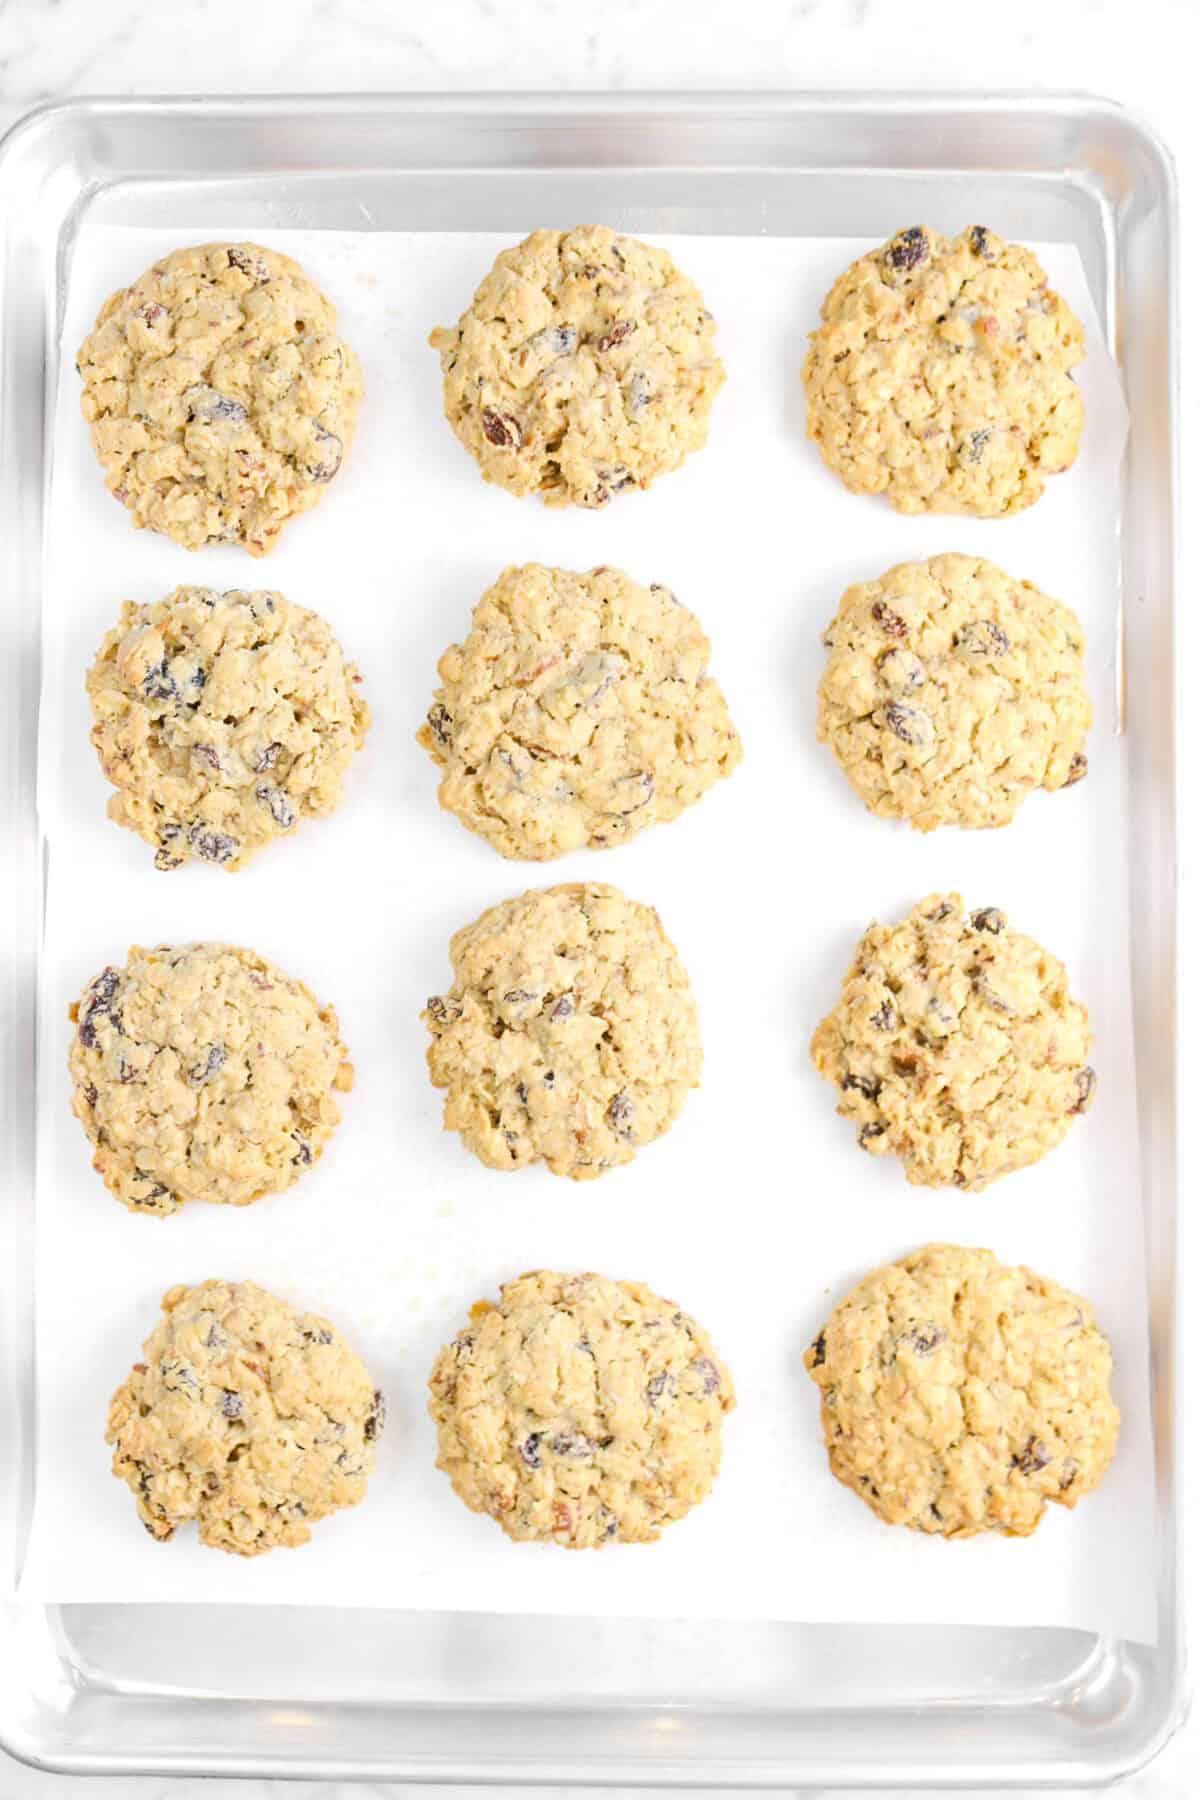 twelve cookies baked on a baking sheet